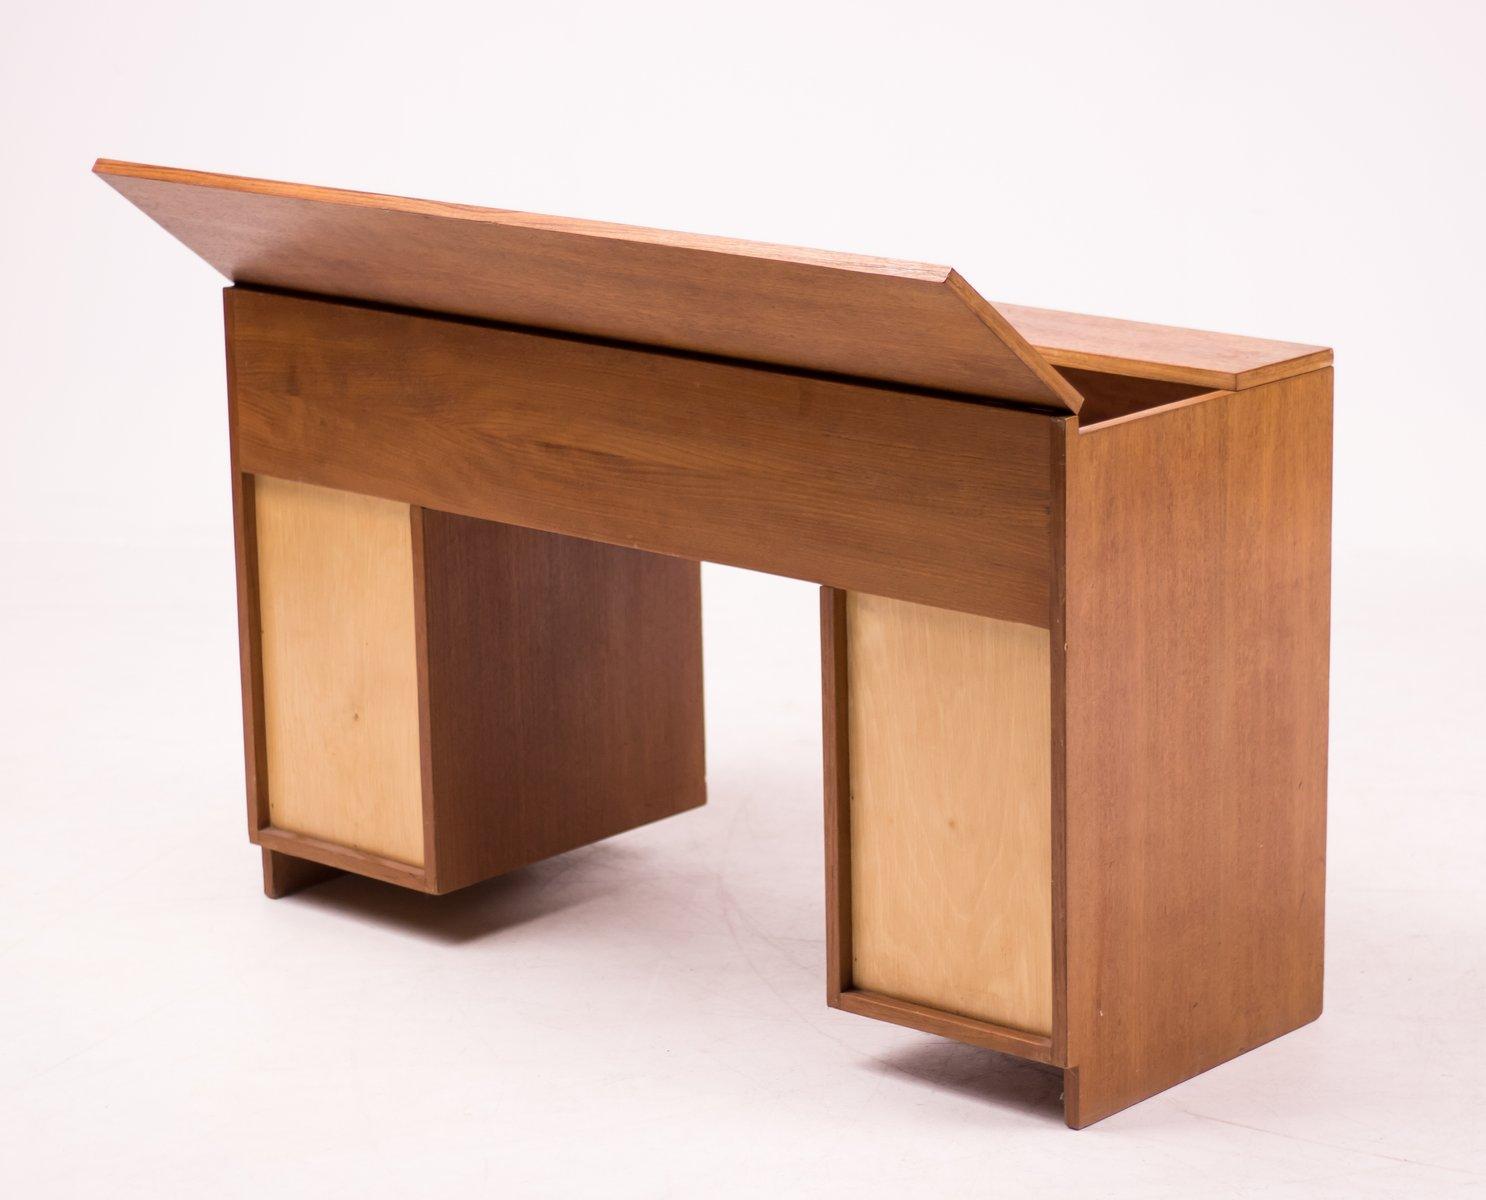 bureau mid century moderne en teck pays bas 1952 en vente sur pamono. Black Bedroom Furniture Sets. Home Design Ideas